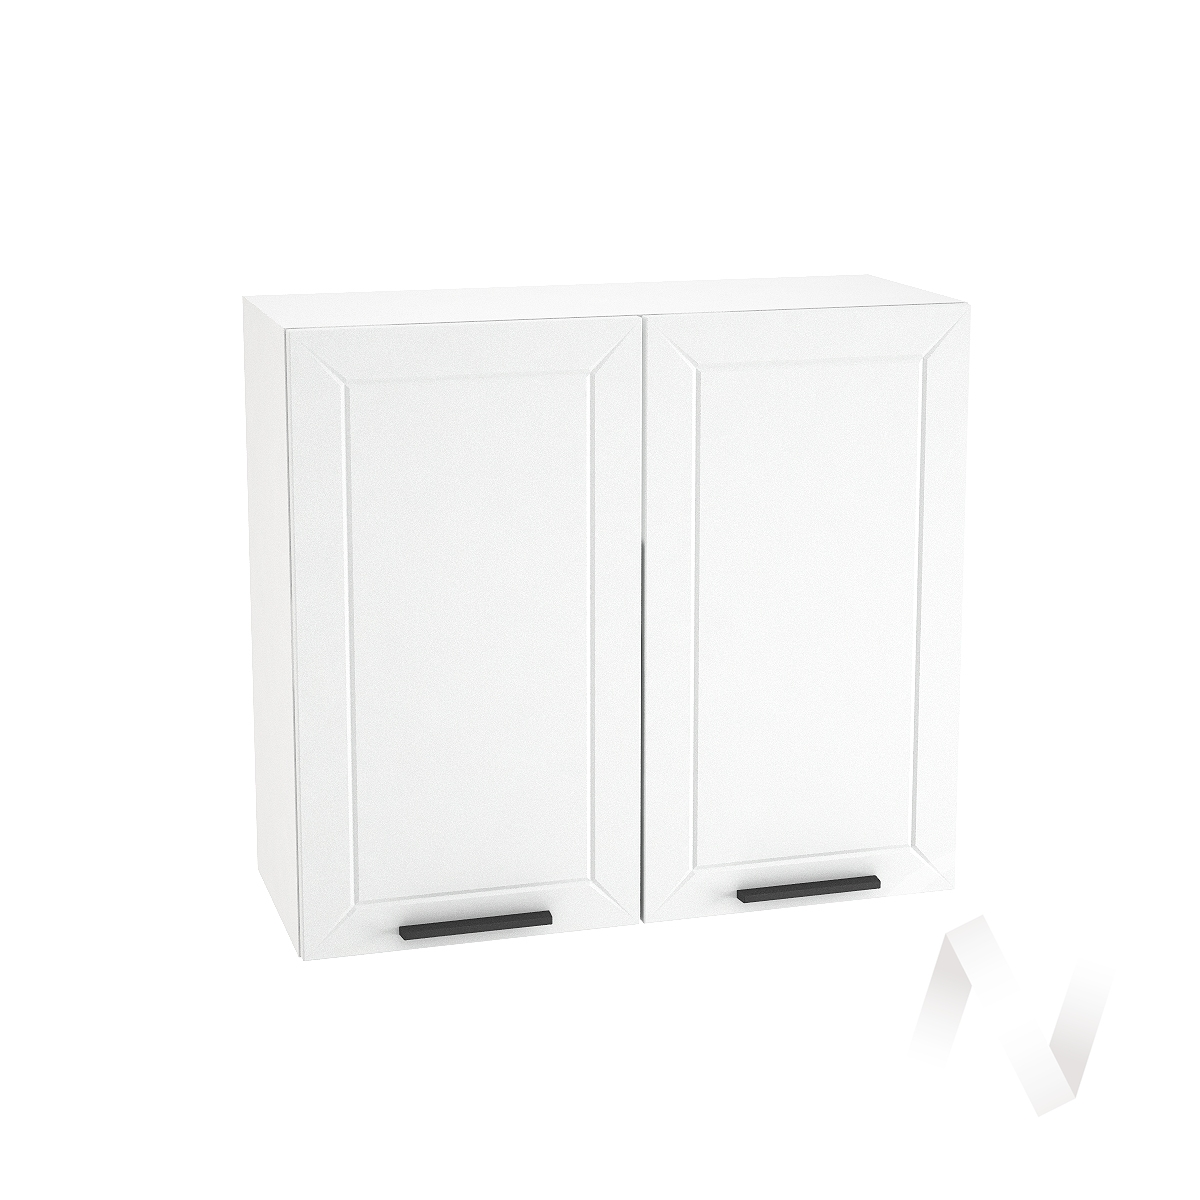 "Кухня ""Глетчер"": Шкаф верхний 800, ШВ 800 (Айленд Силк/корпус белый)"